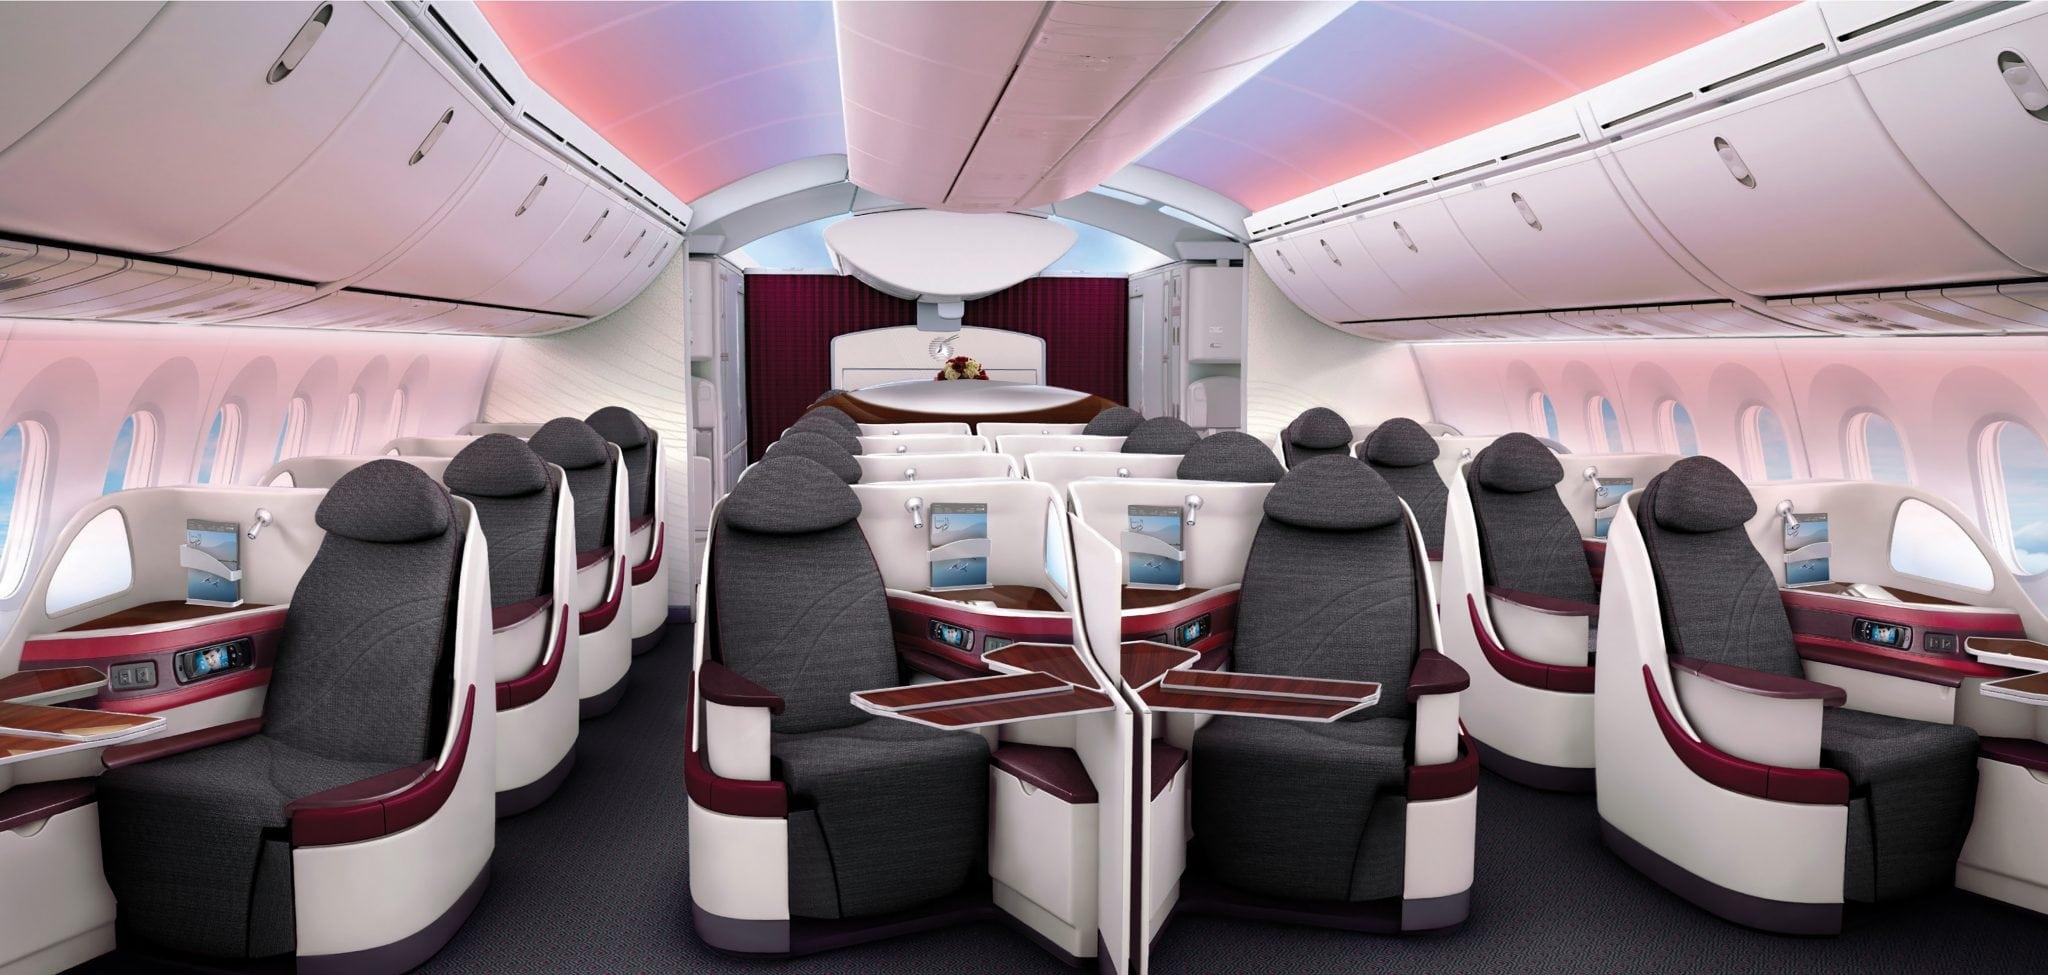 B/E Aerospace Super Diamond business class seat